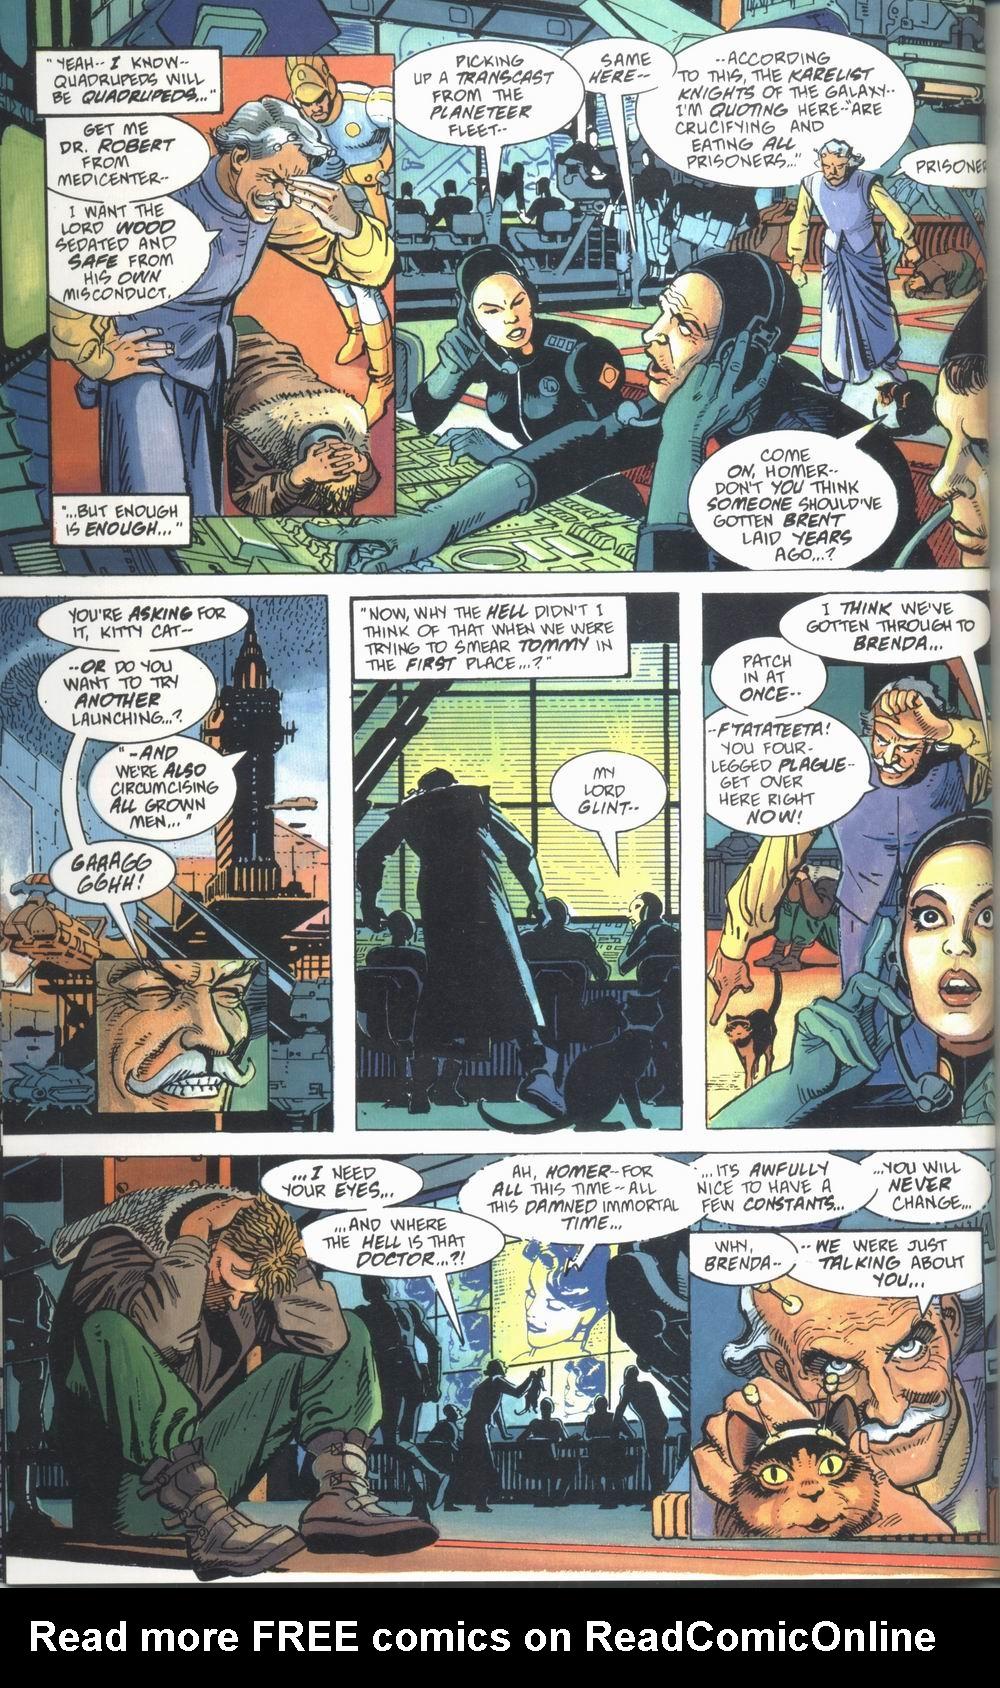 Read online Twilight comic -  Issue #3 - 13